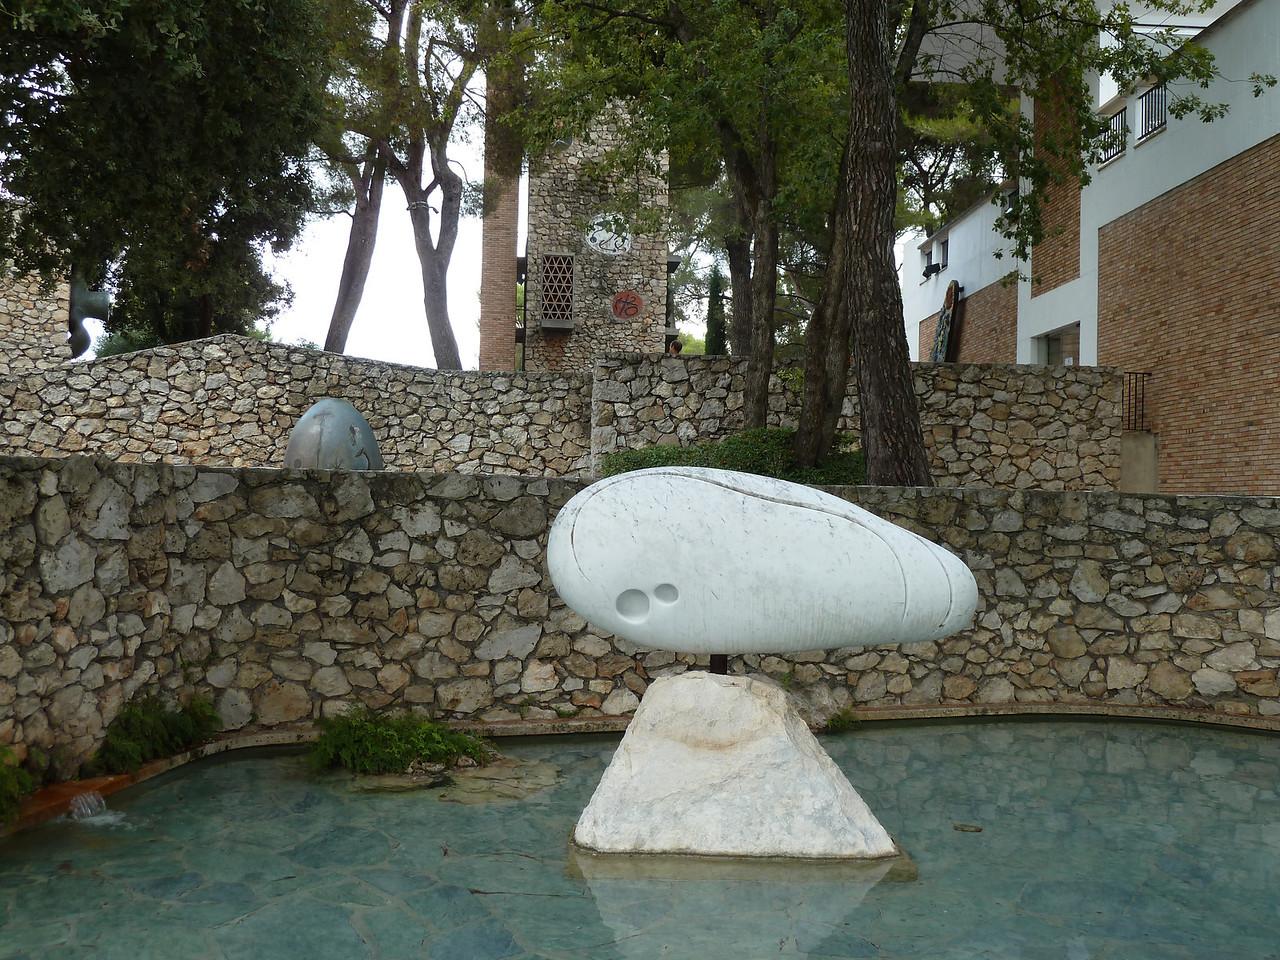 Another Miro sculpture....